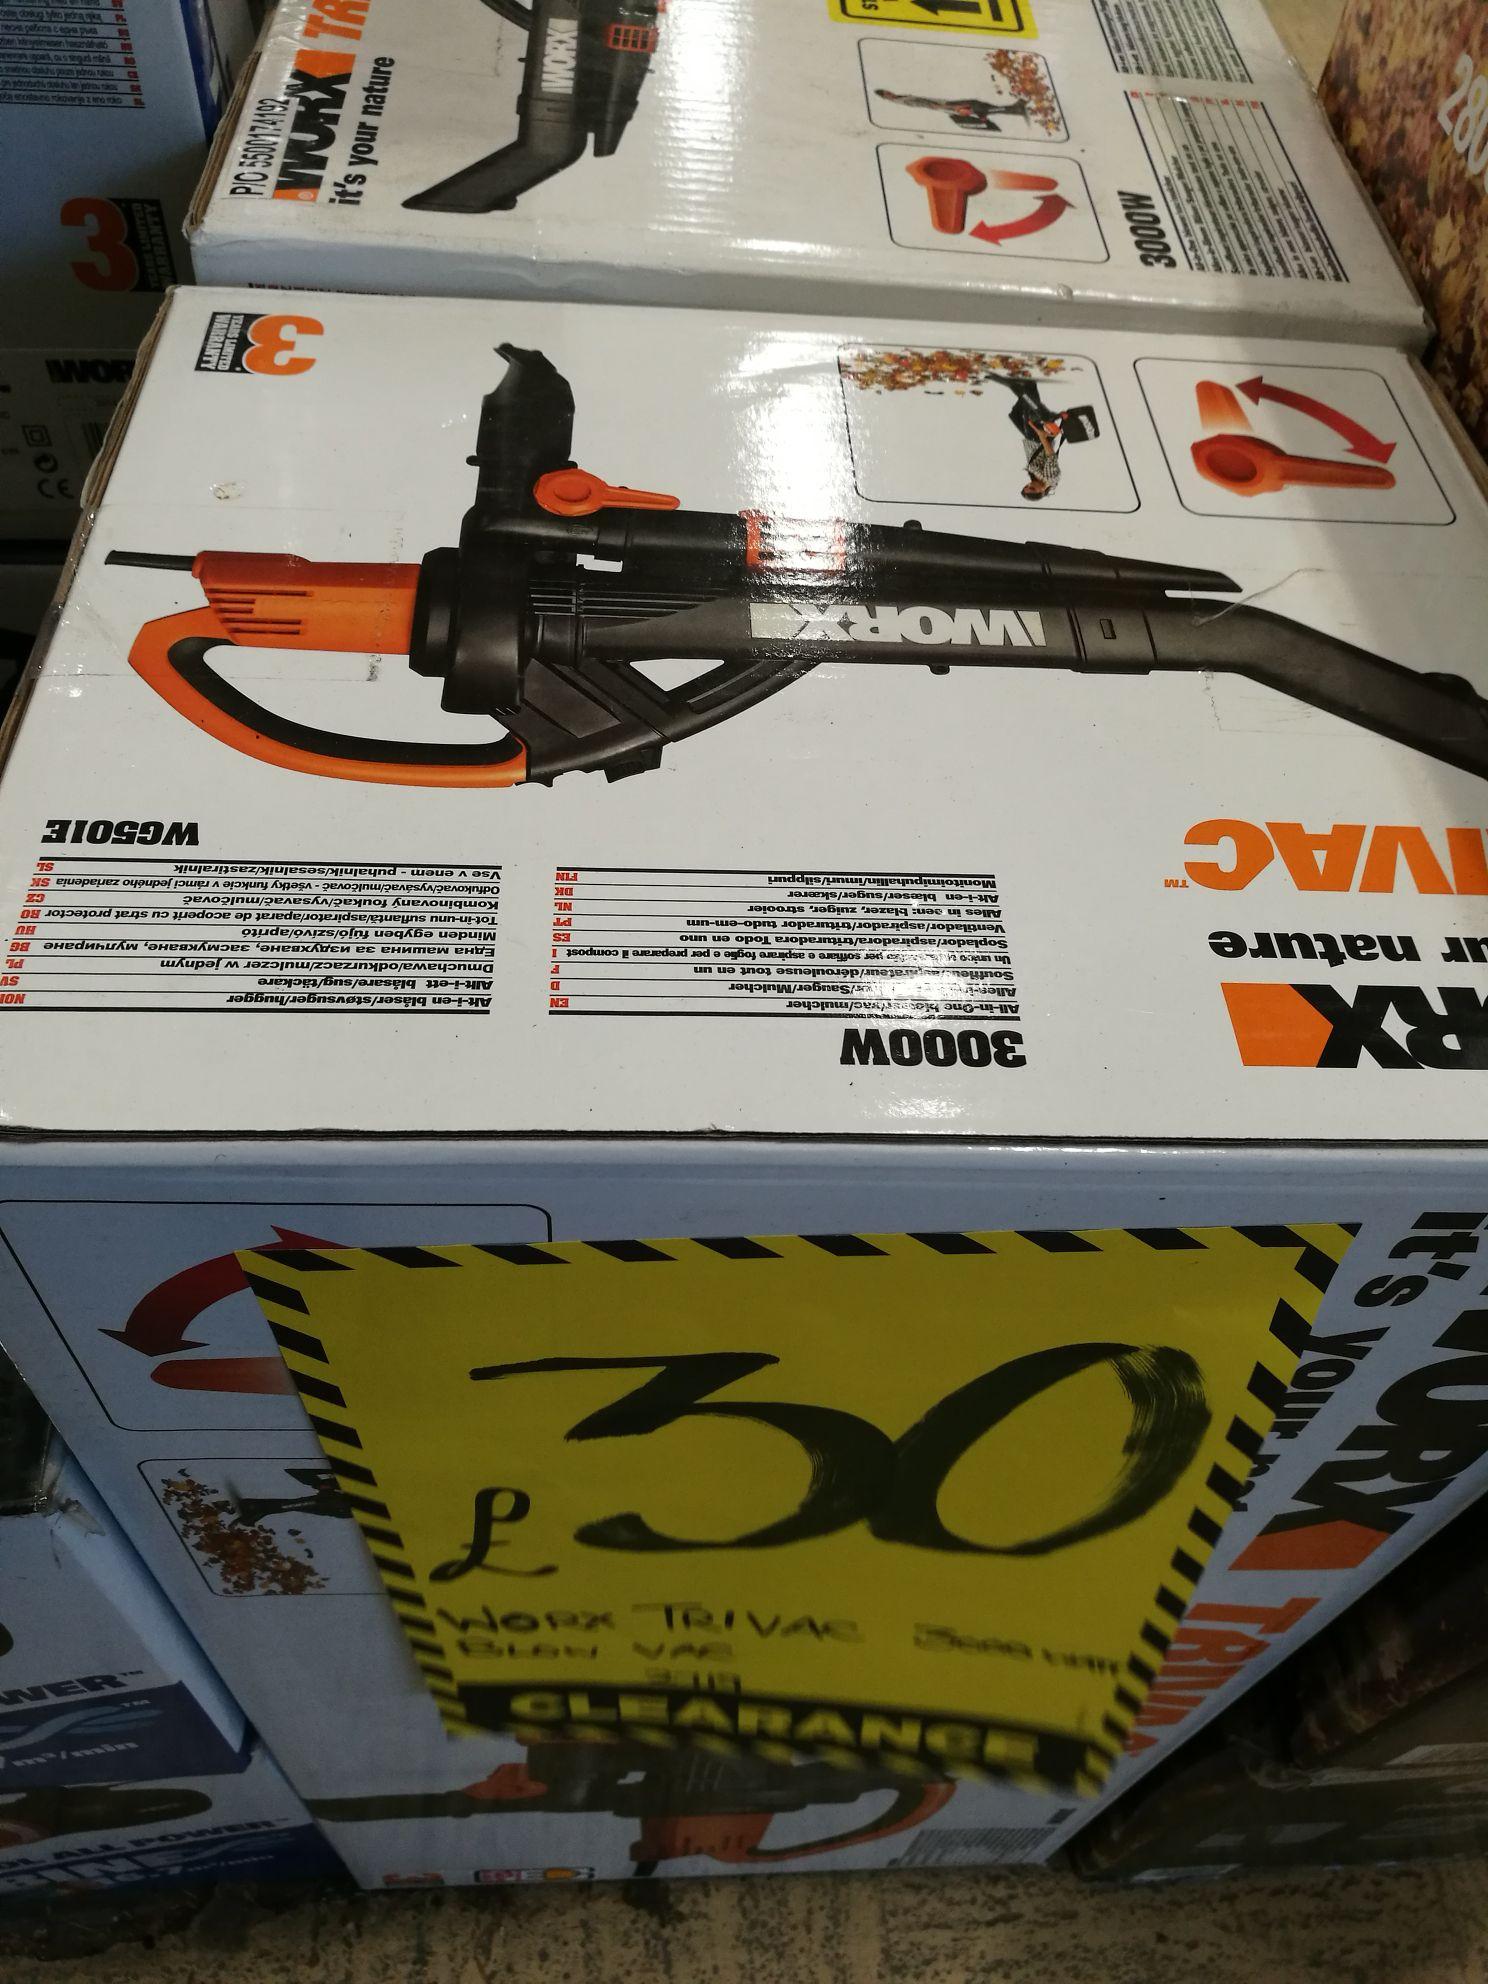 Worx Trivac WG501E blower vac at Homebase for £25.50